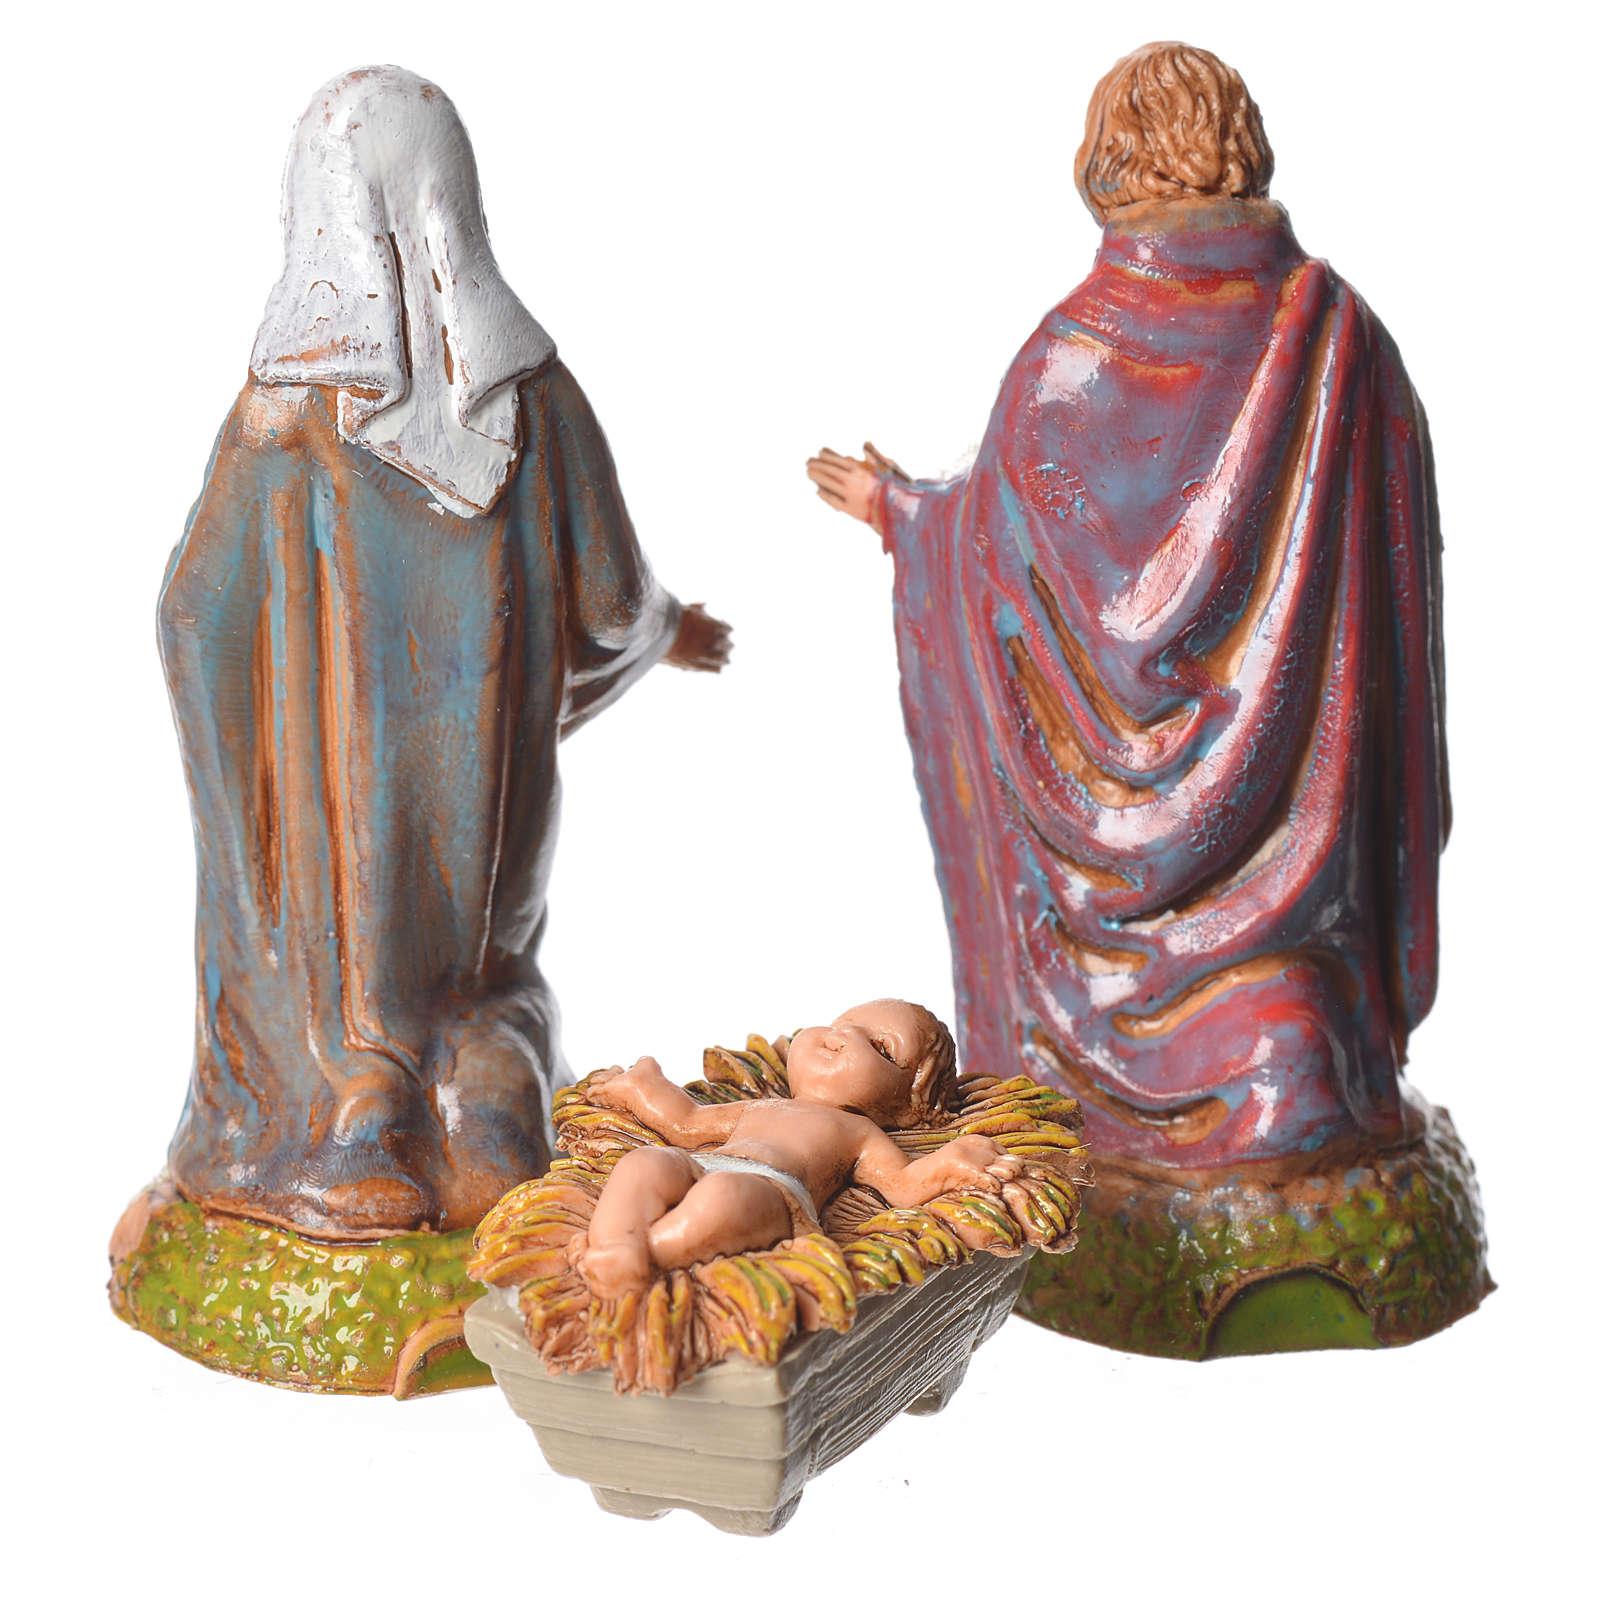 Nacimiento Belén Moranduzzo 6 cm 3 figuras 4